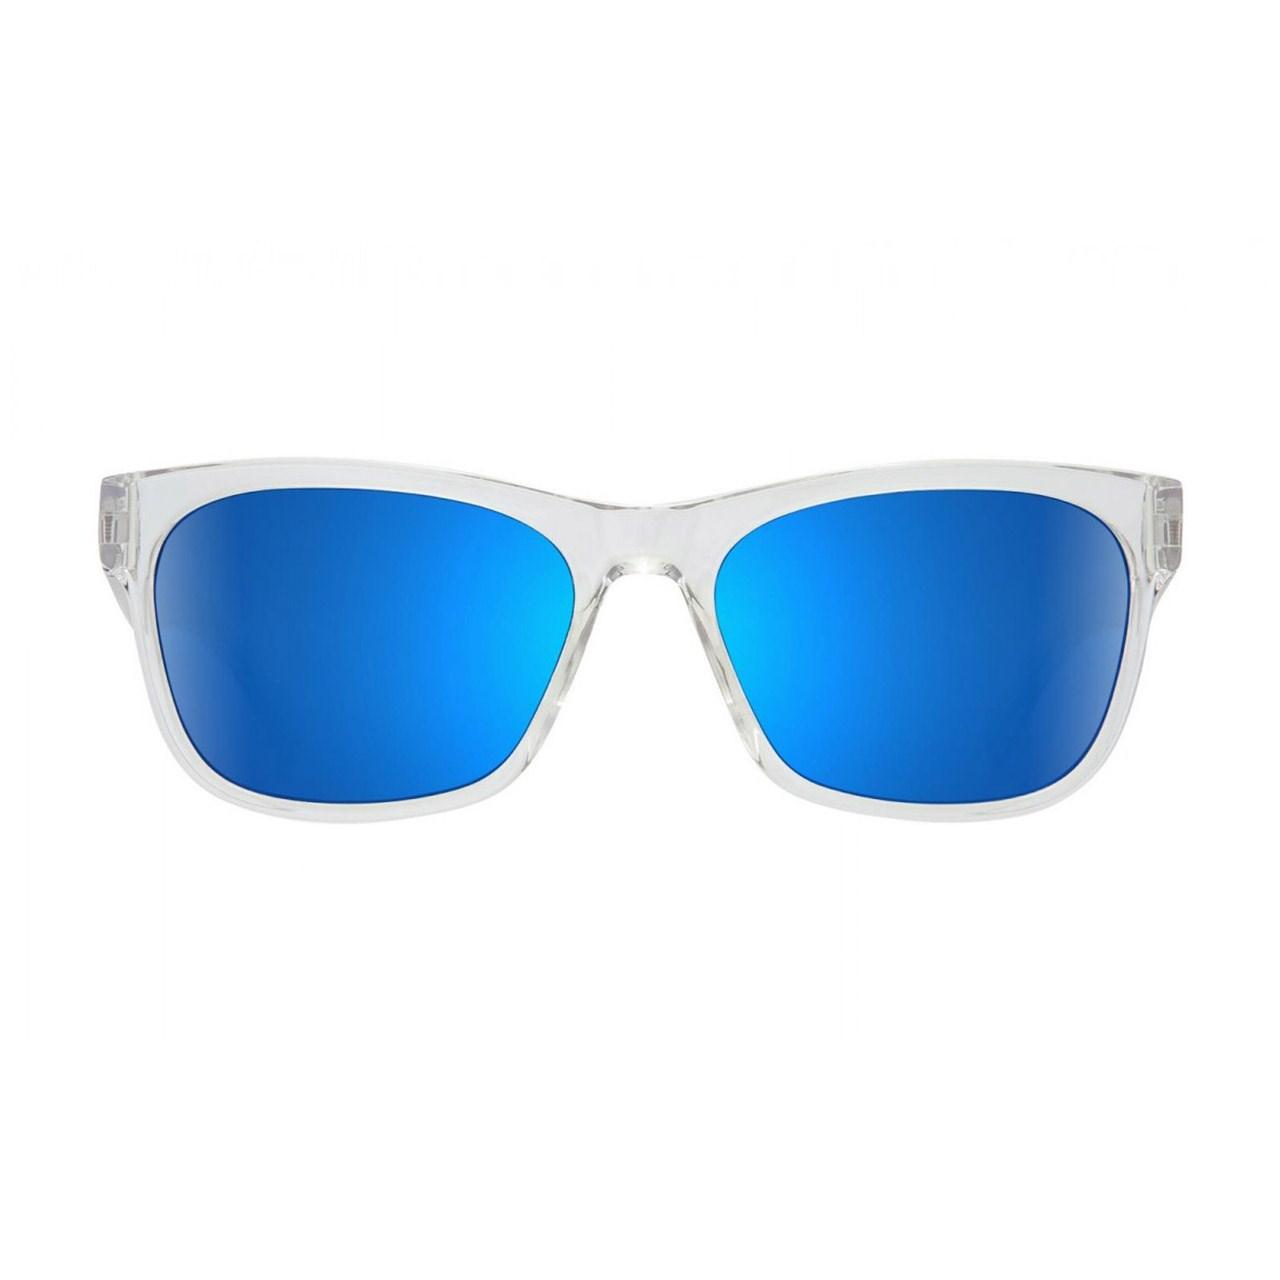 عینک آفتابی اسپای سری Sundowner مدل Ceystal/Gray Dark Blue Spectra